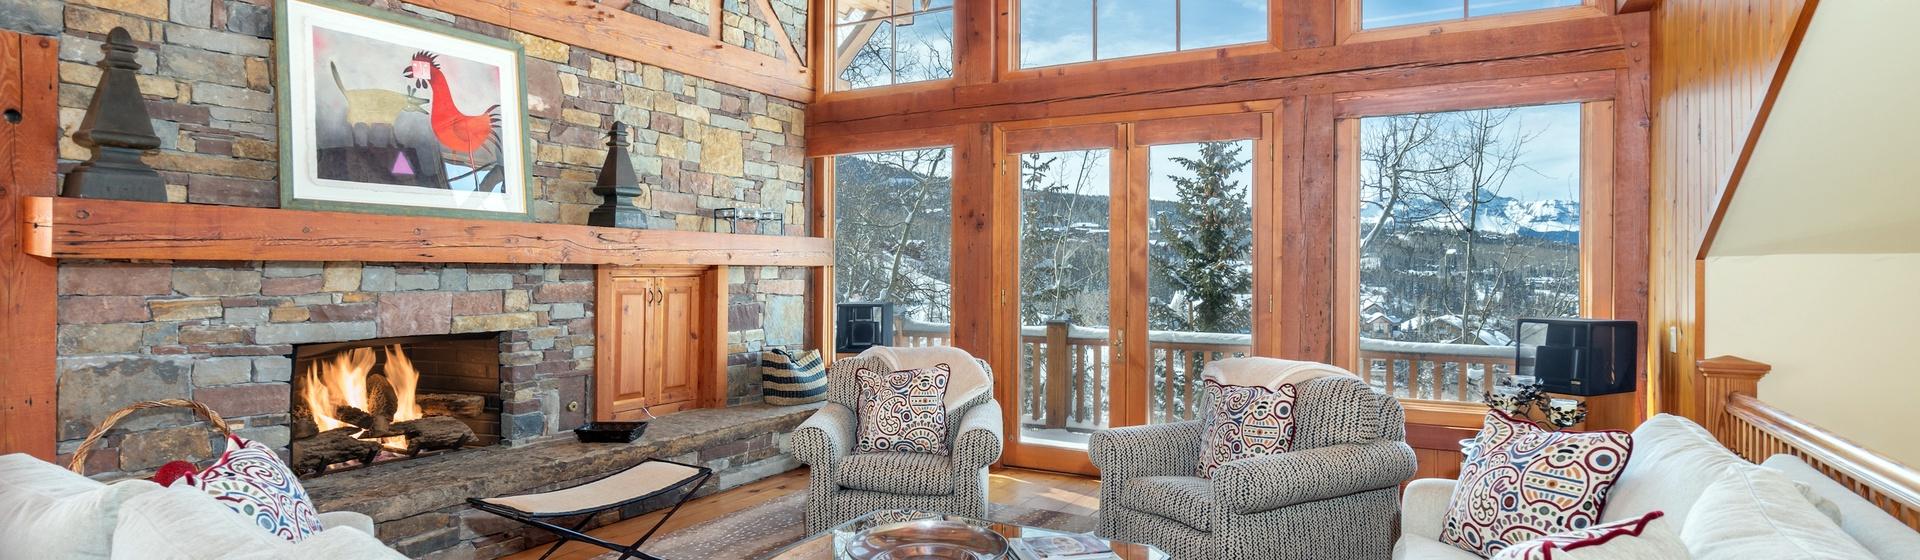 2-MountainVillage-Positive-Outlook-Living-Room-Web.jpg